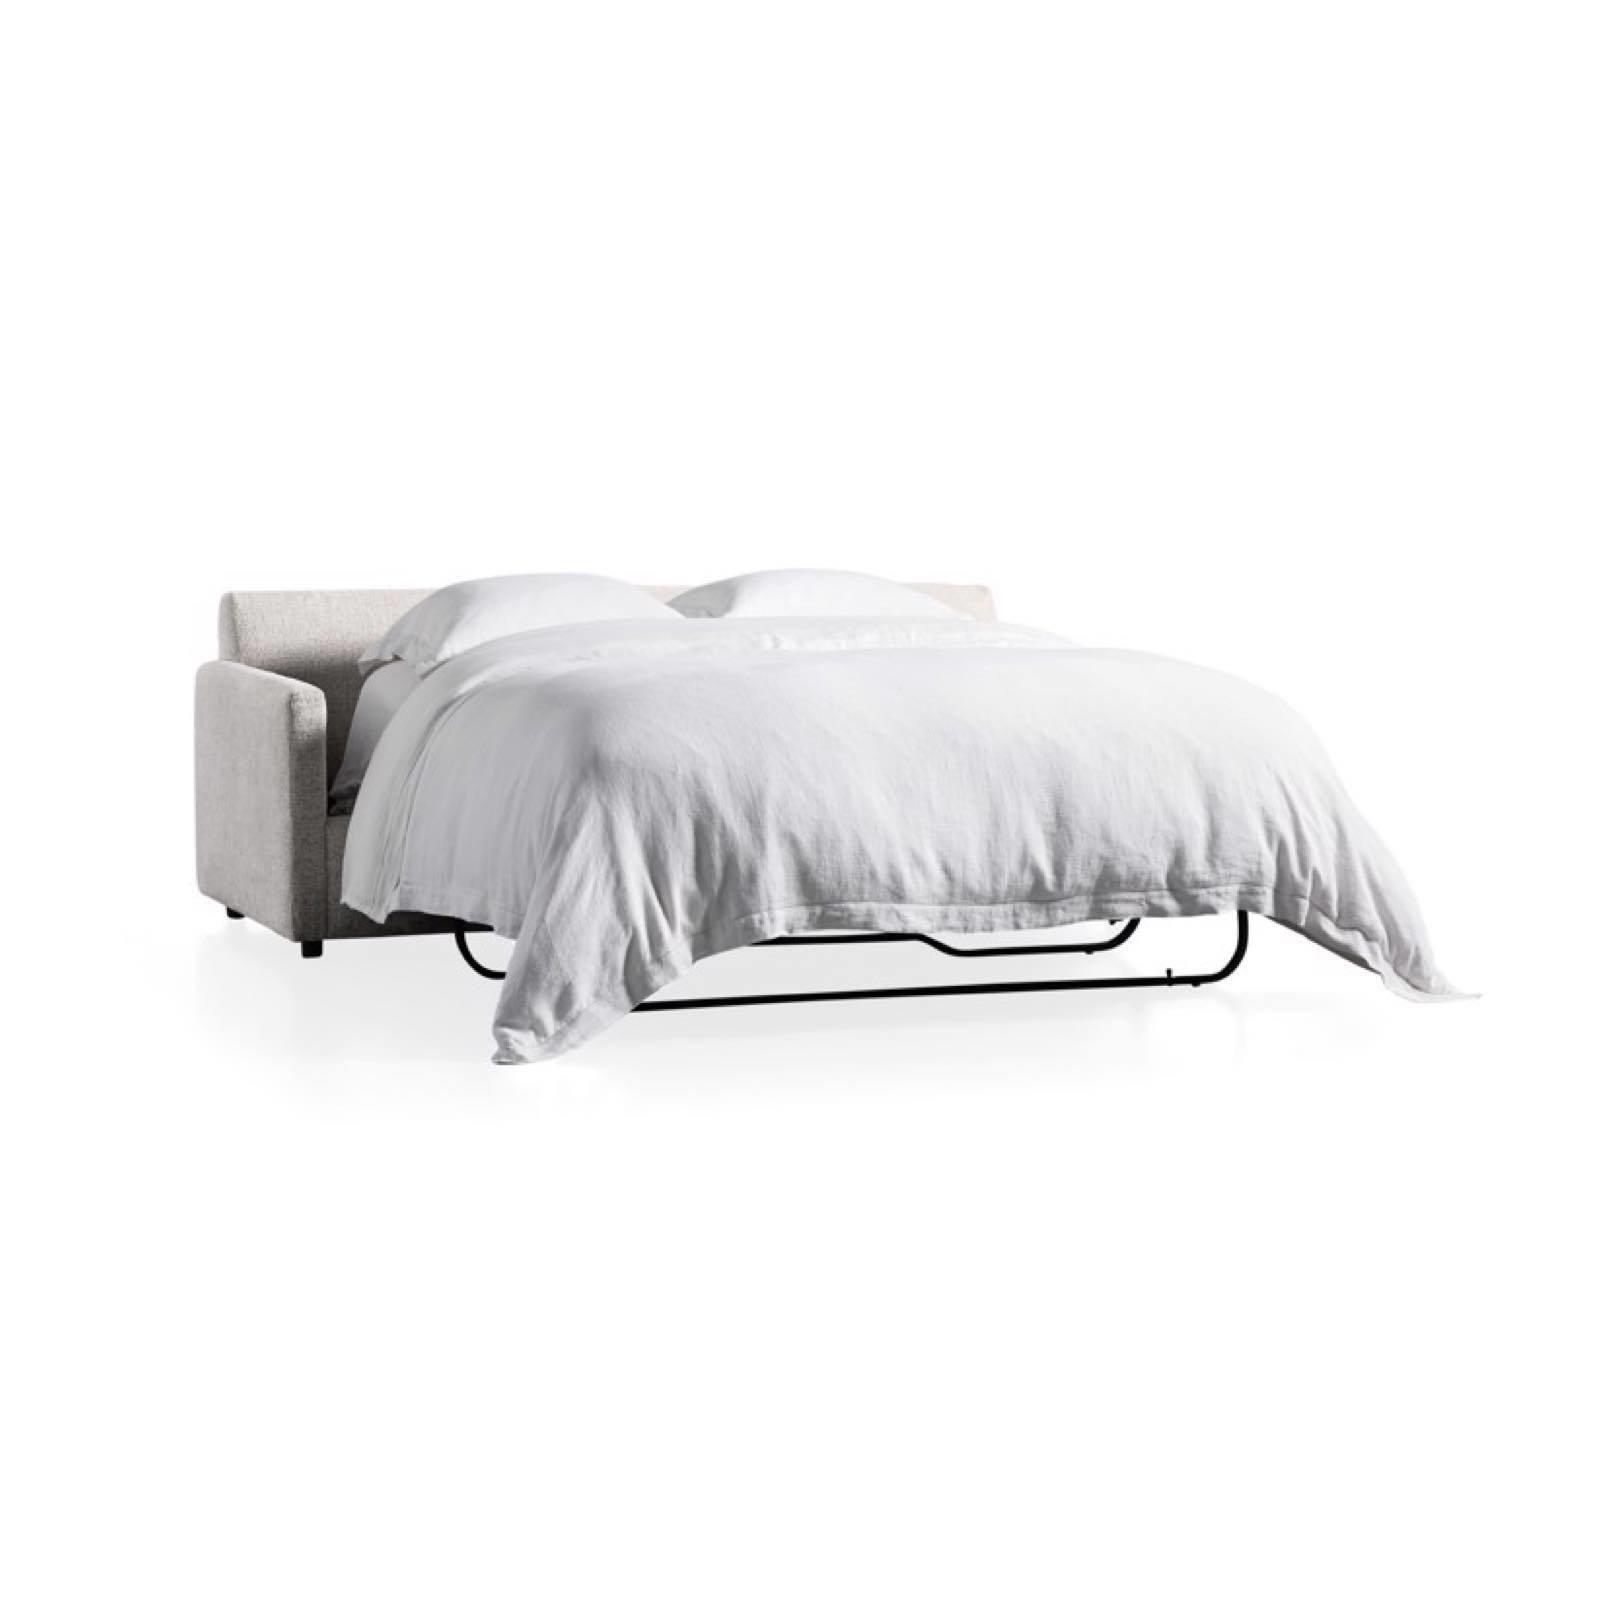 Super Arhaus Kipton Sleeper Sofa By Arhaus Dwell Customarchery Wood Chair Design Ideas Customarcherynet